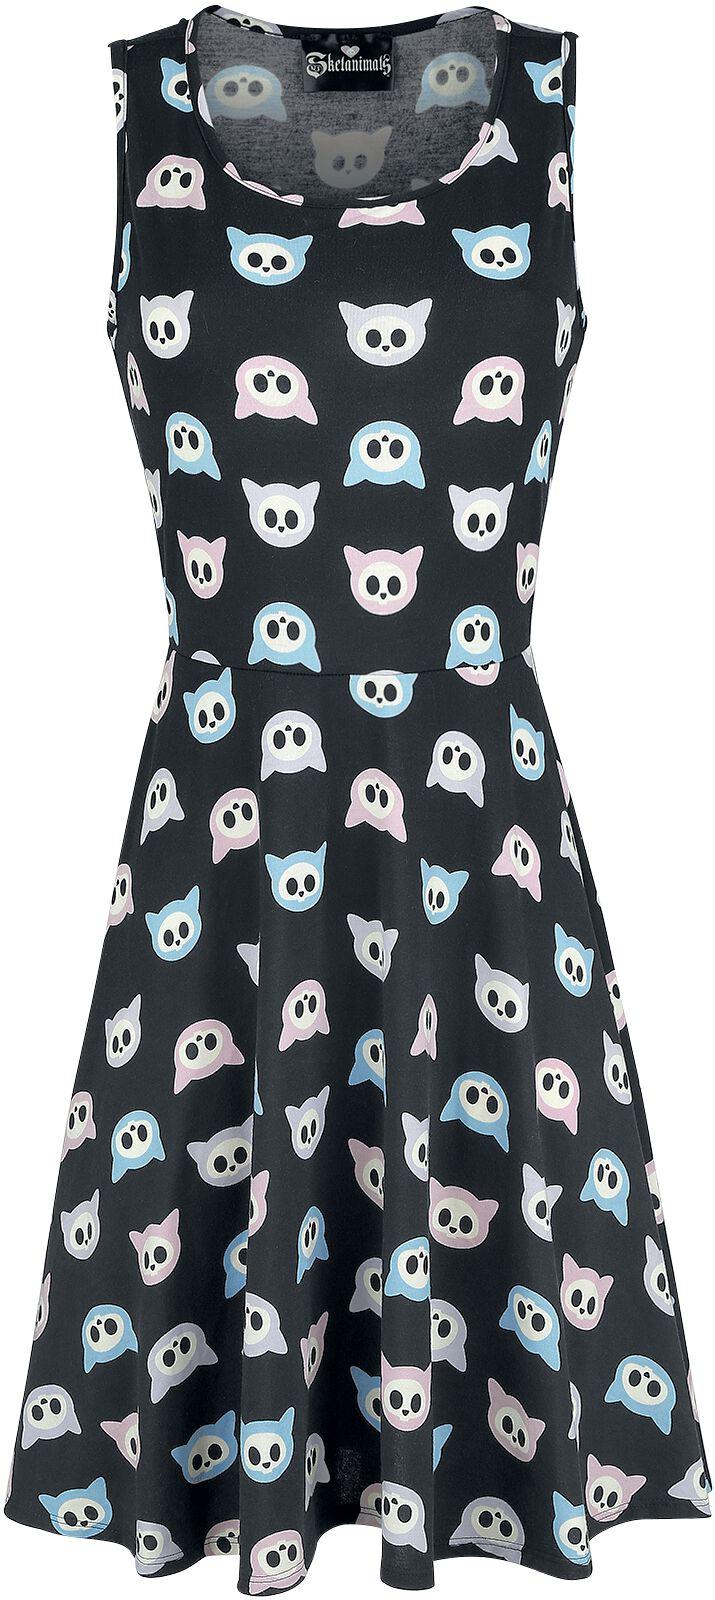 Merch dla Fanów - Sukienki - Sukienka Skelanimals Kit The Cat - Pastel Sukienka wielokolorowy - 348480